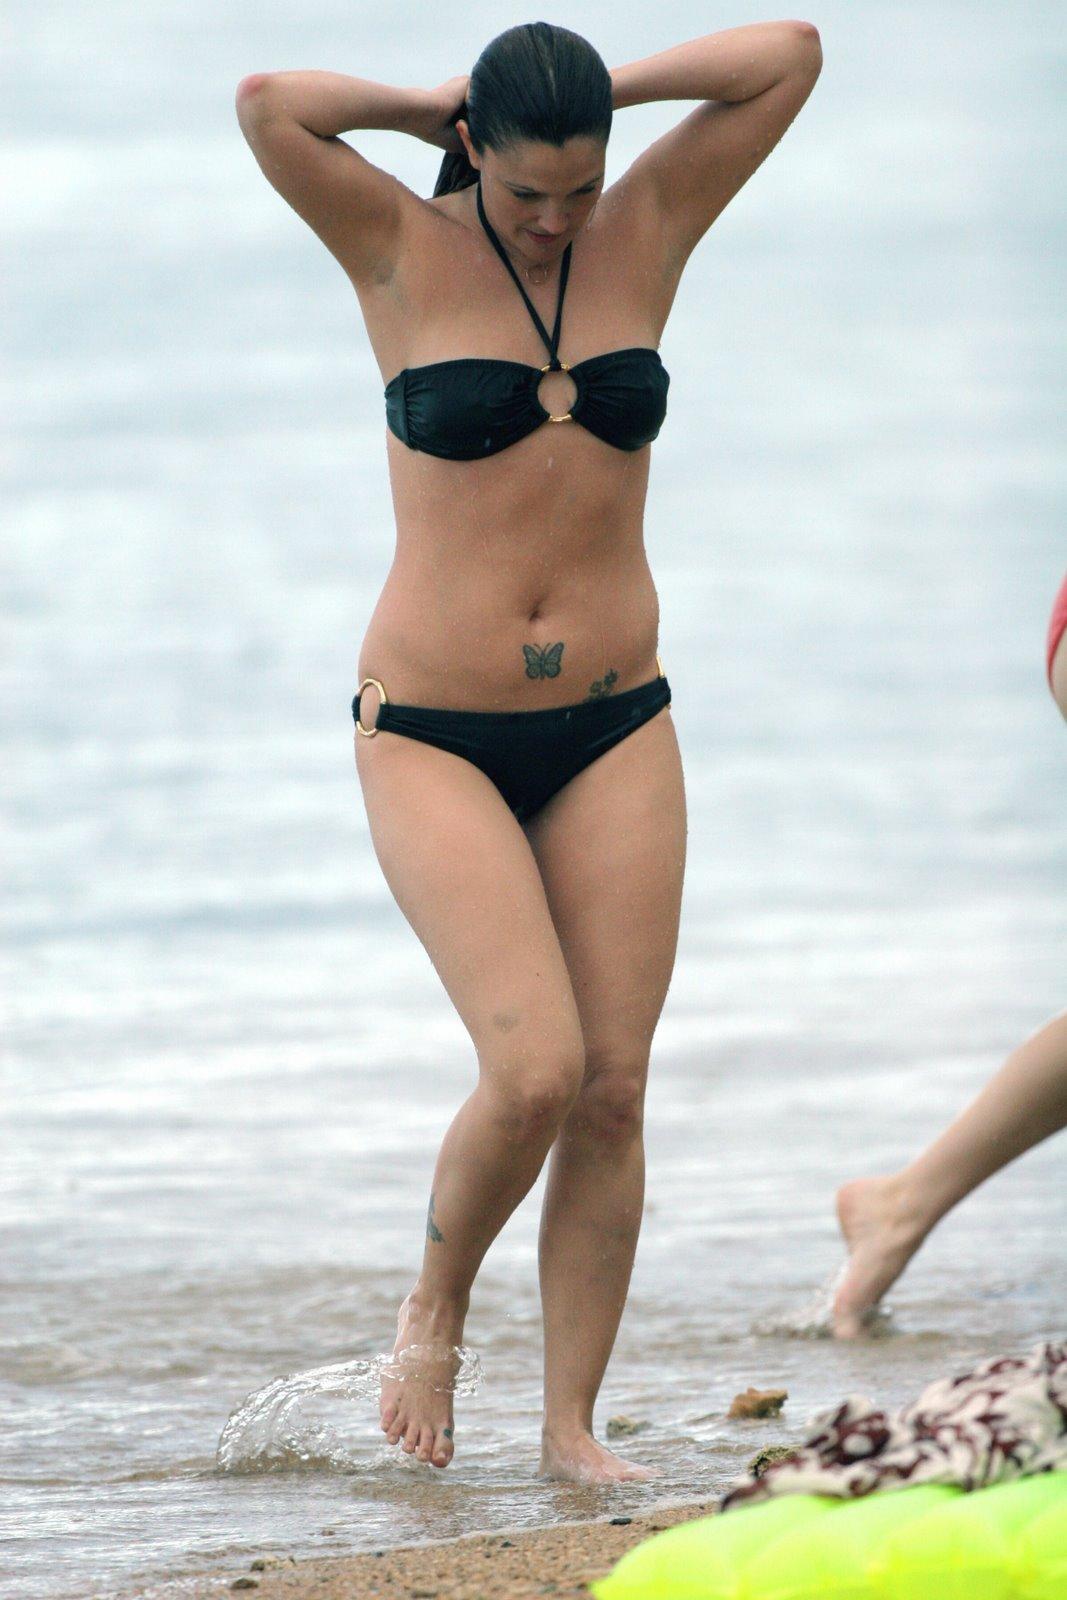 Usete Drew Barrymore Hot Bikini wallpapers 521-3128